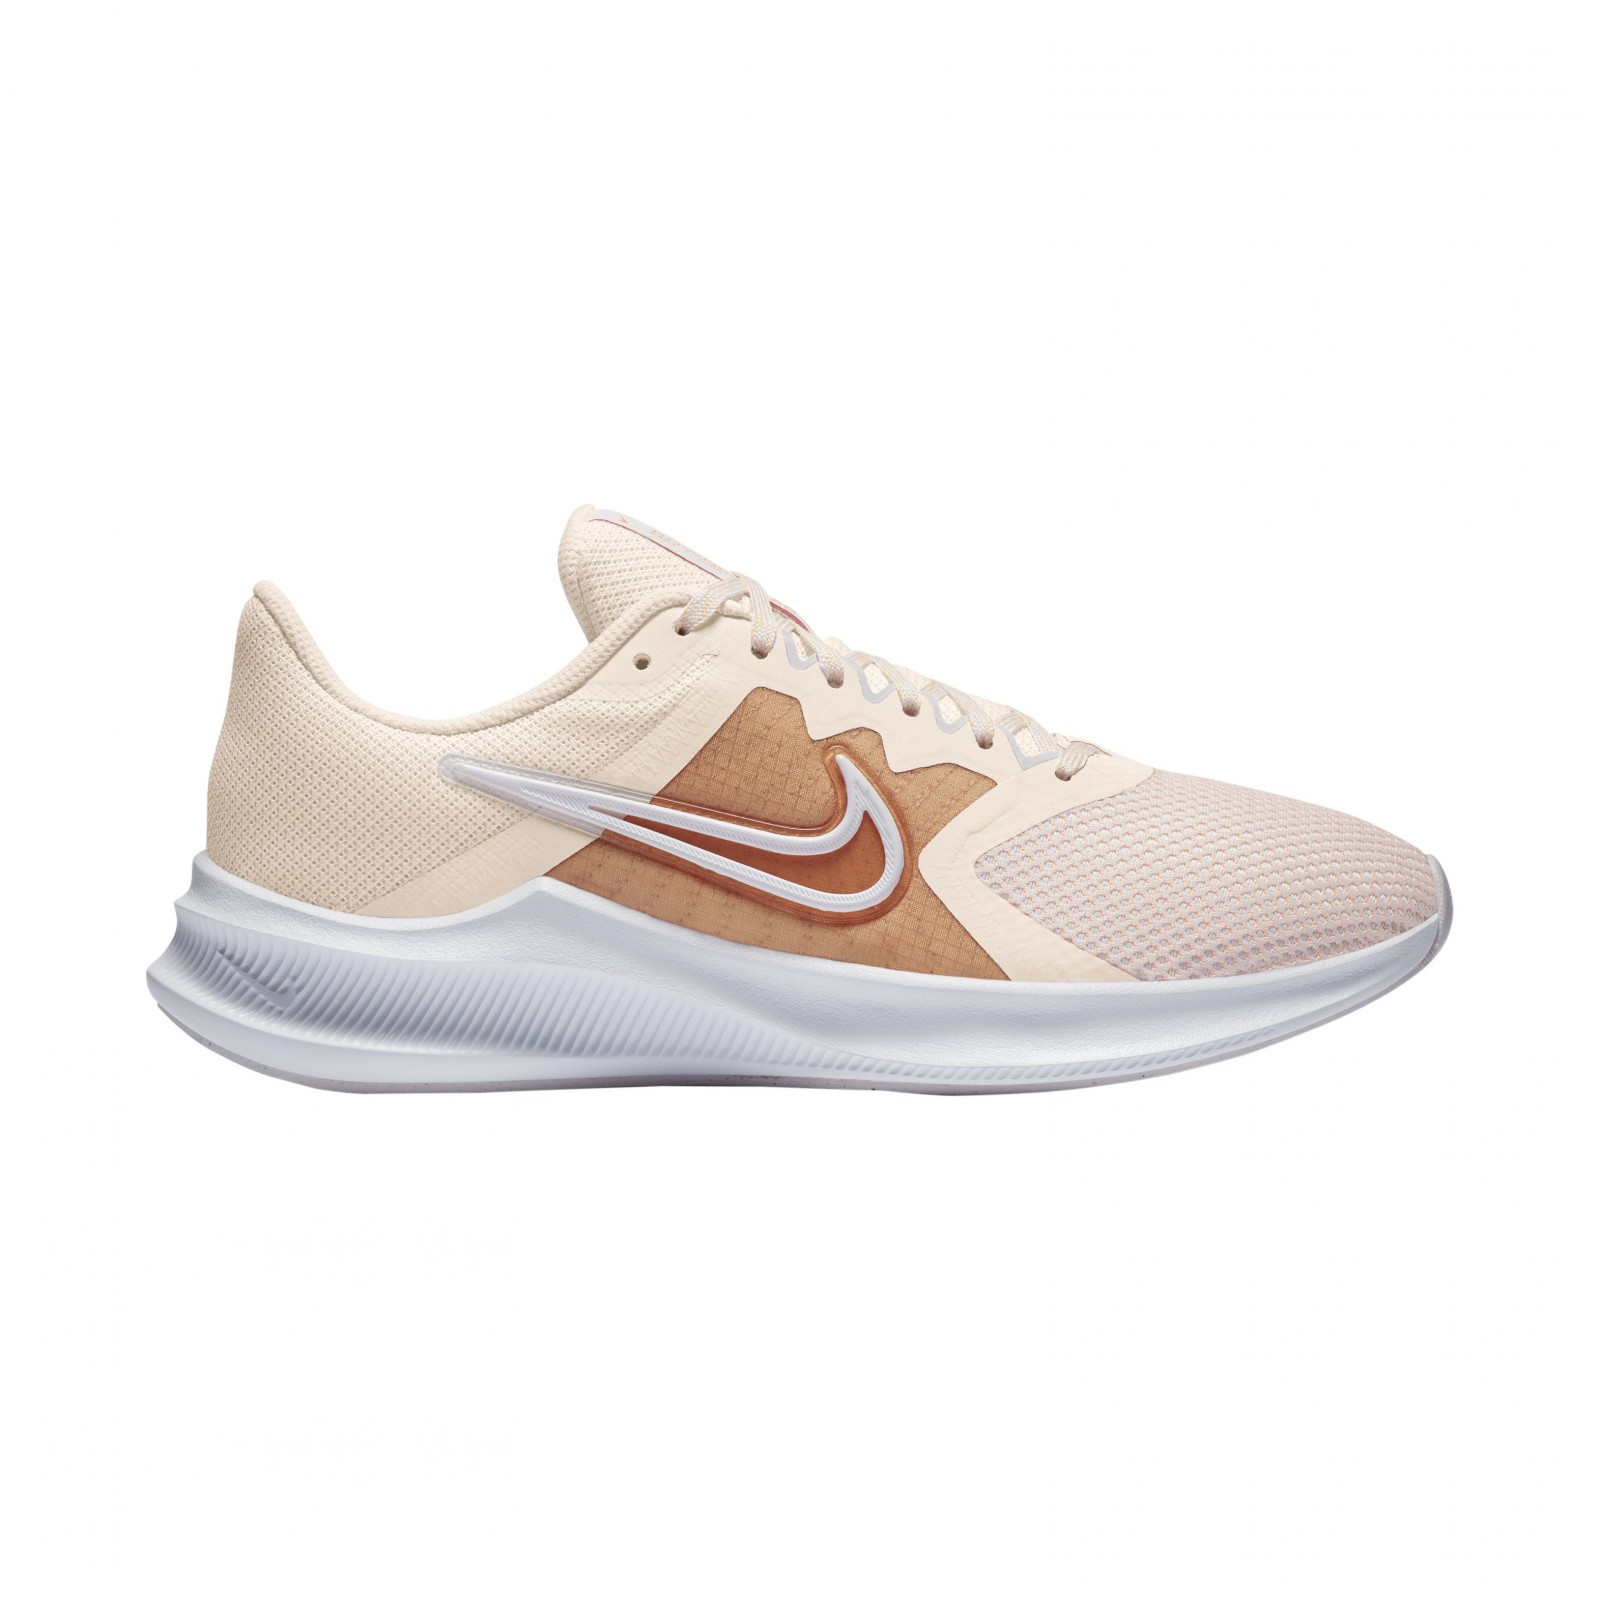 Nike Downshifter 11 LIGHT SOFT PINK/WHITE-PEACH CREAM-VENICE